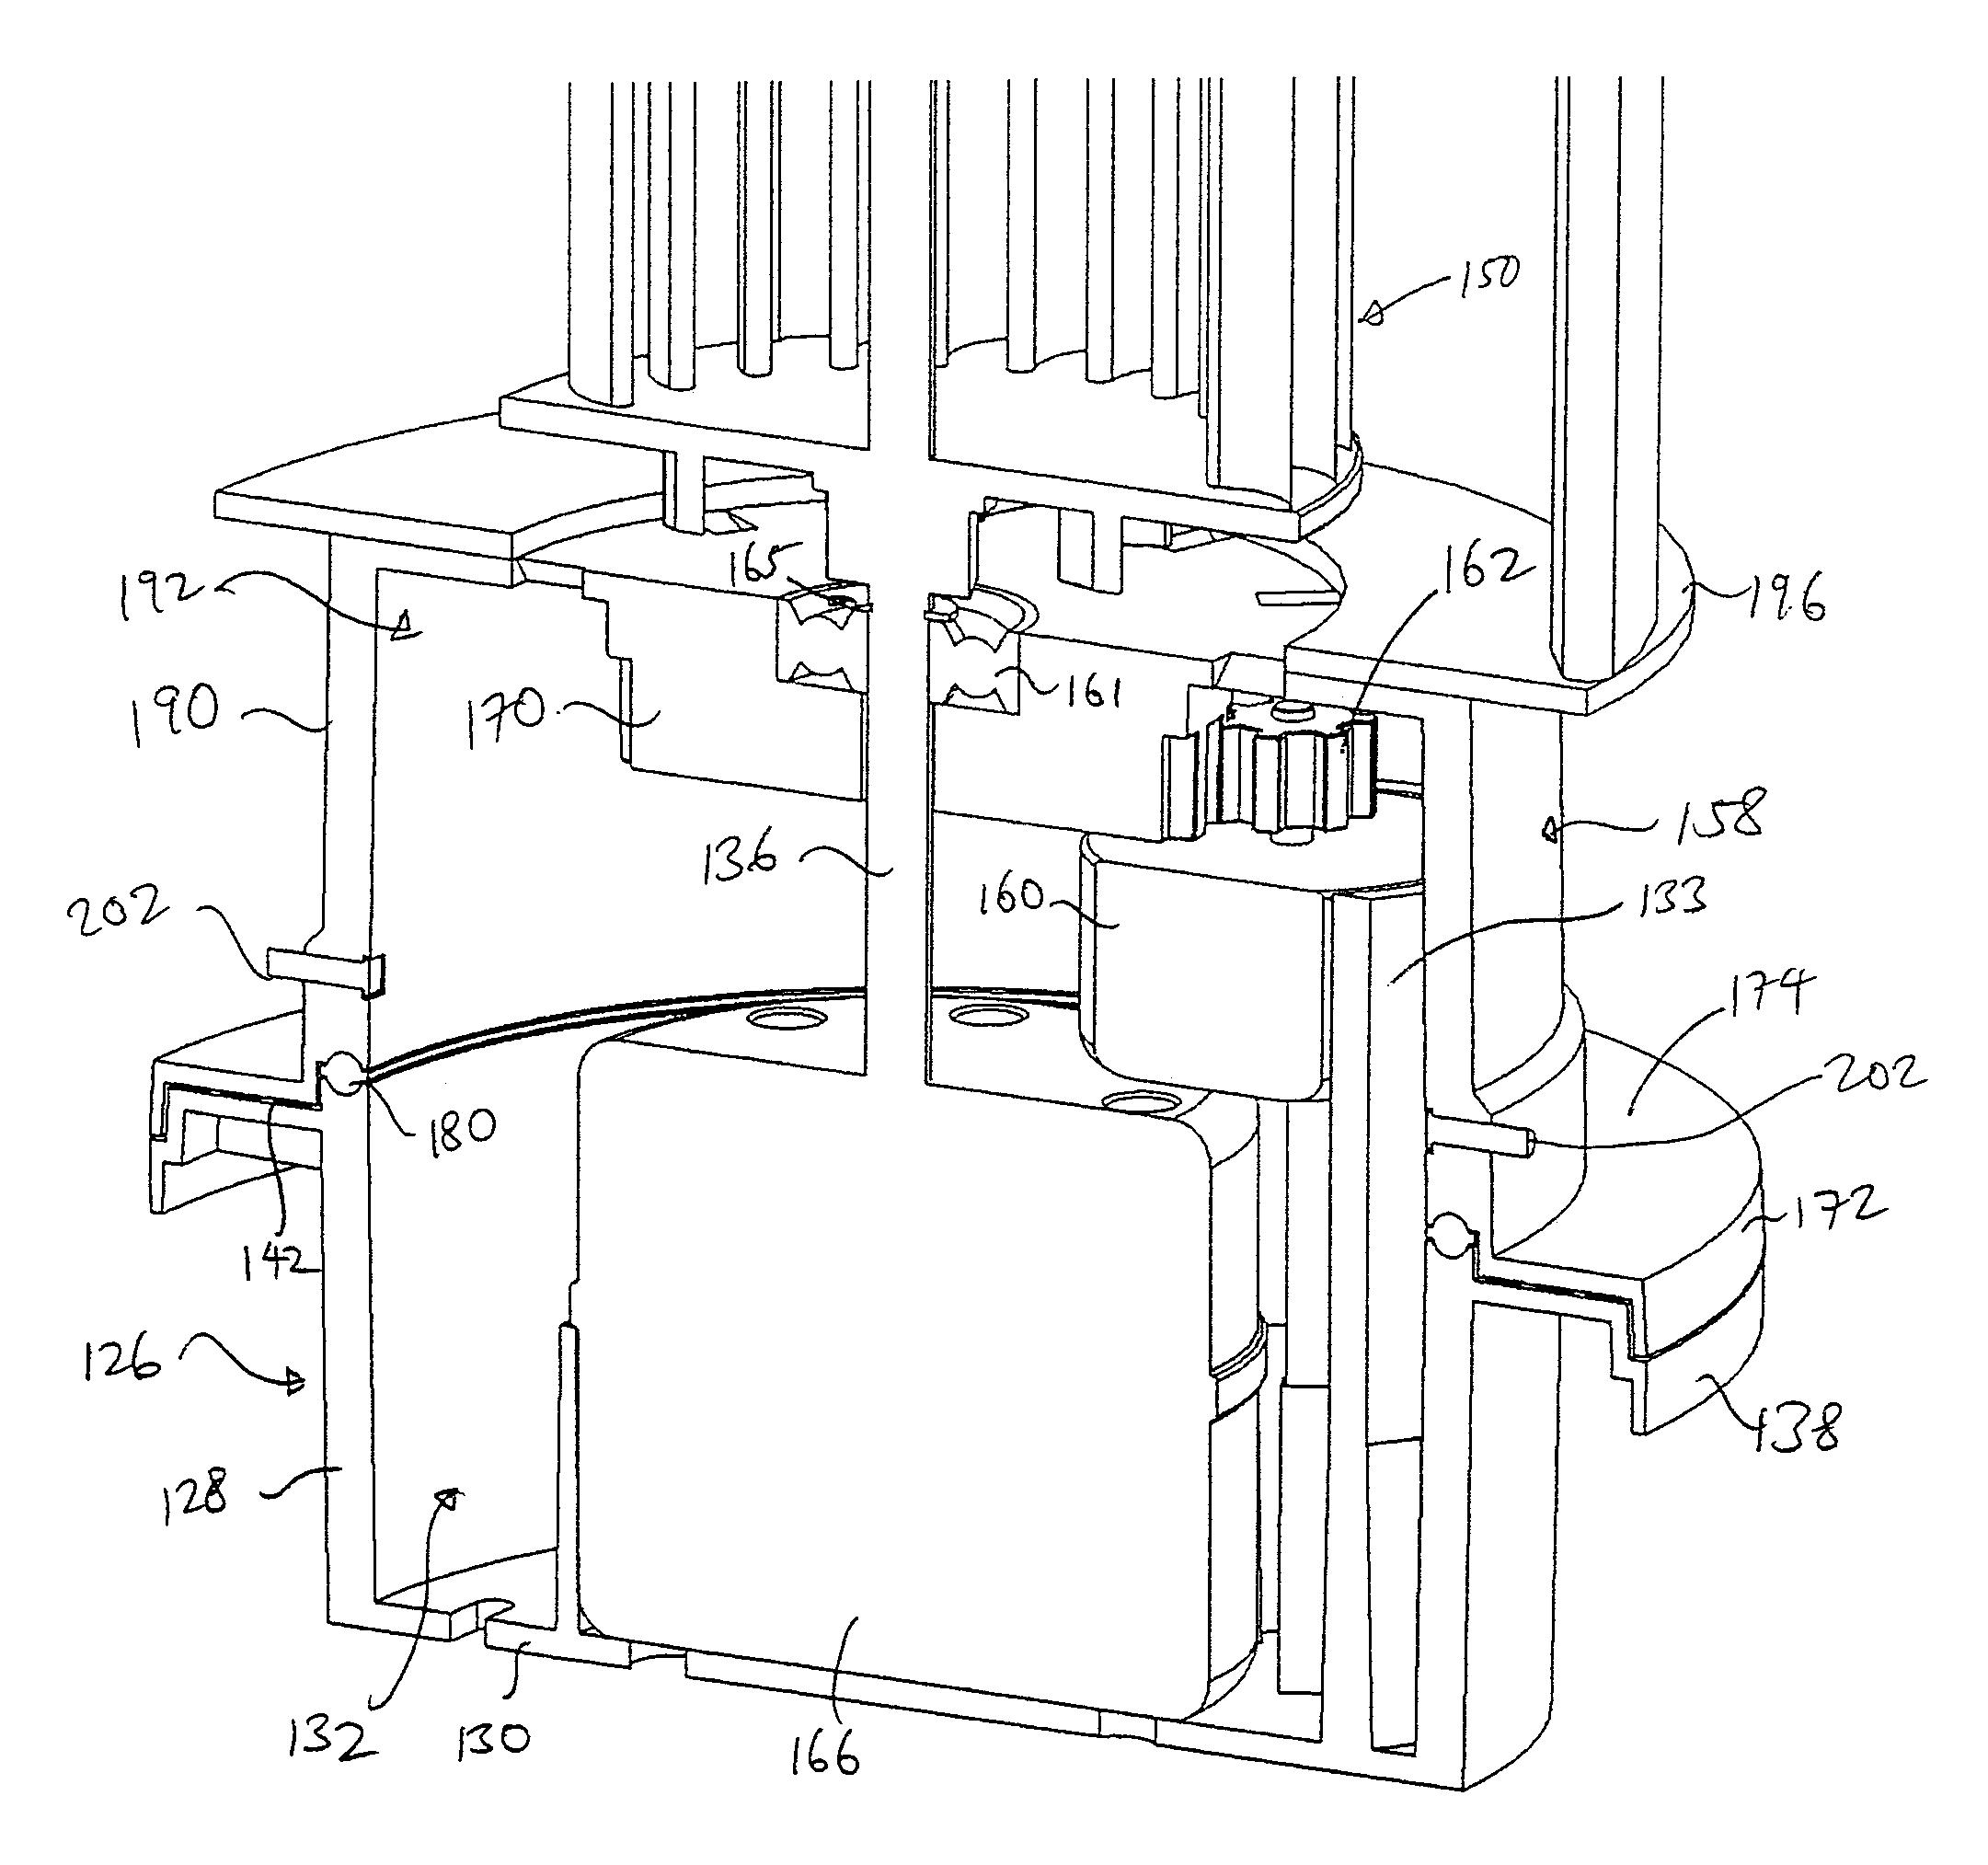 Lasko Heater Wiring Diagram Whirlpool Washing Machine